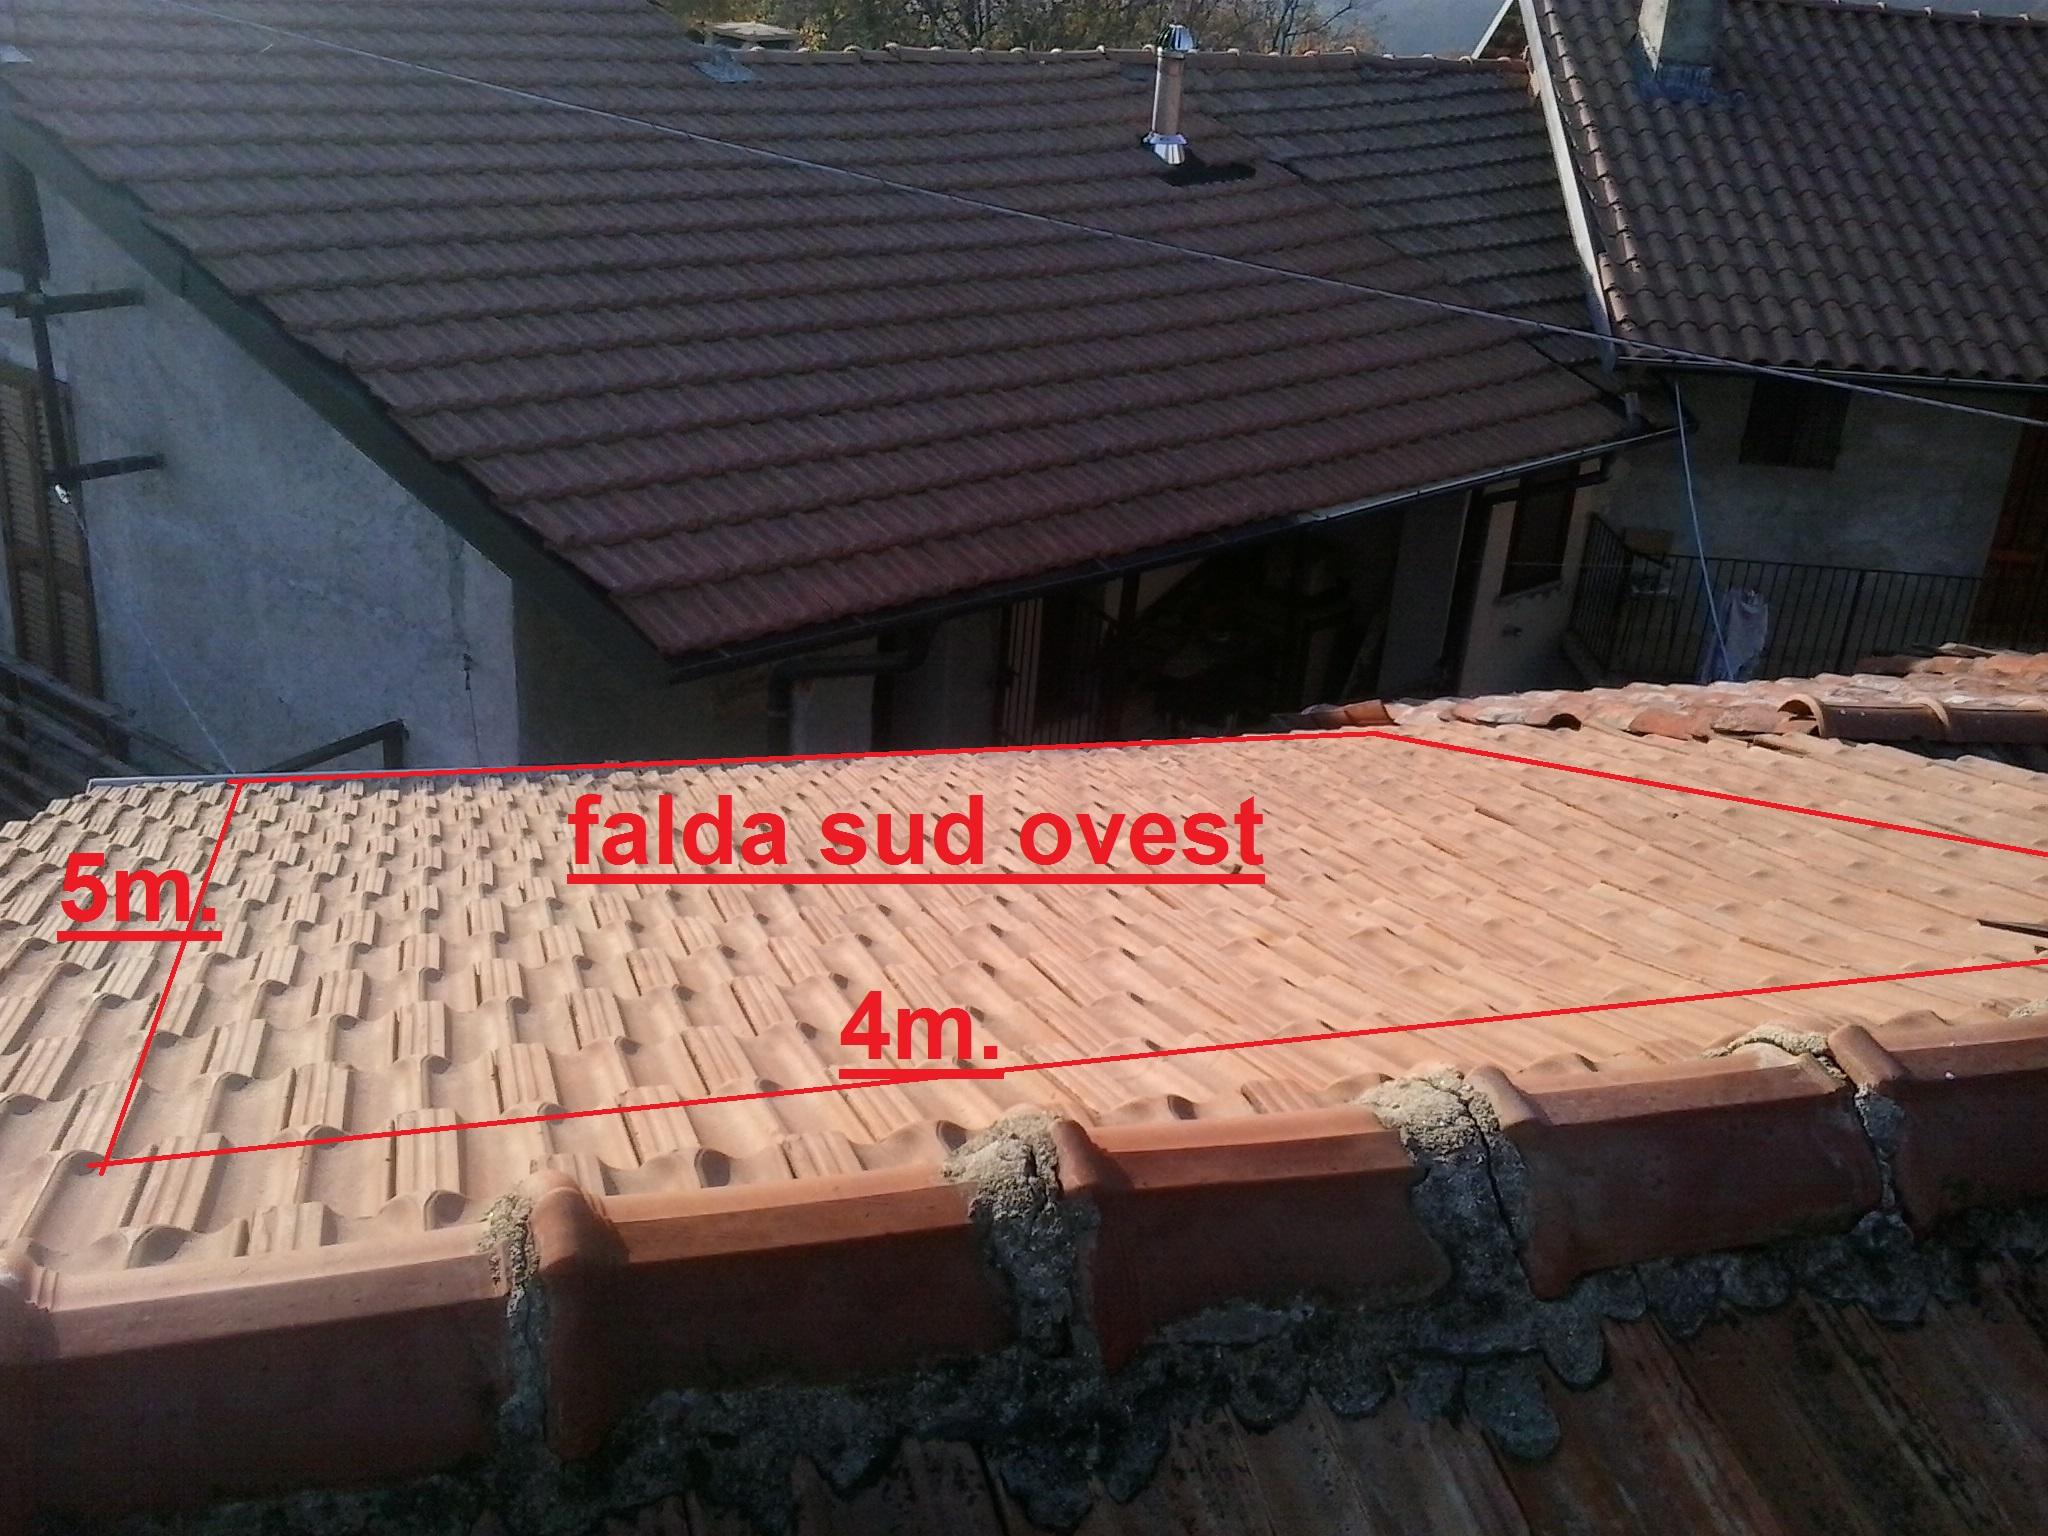 http://www.energialternativa.info/public/newforum/ForumEA/U/Falda%20sud%20ovest.jpg